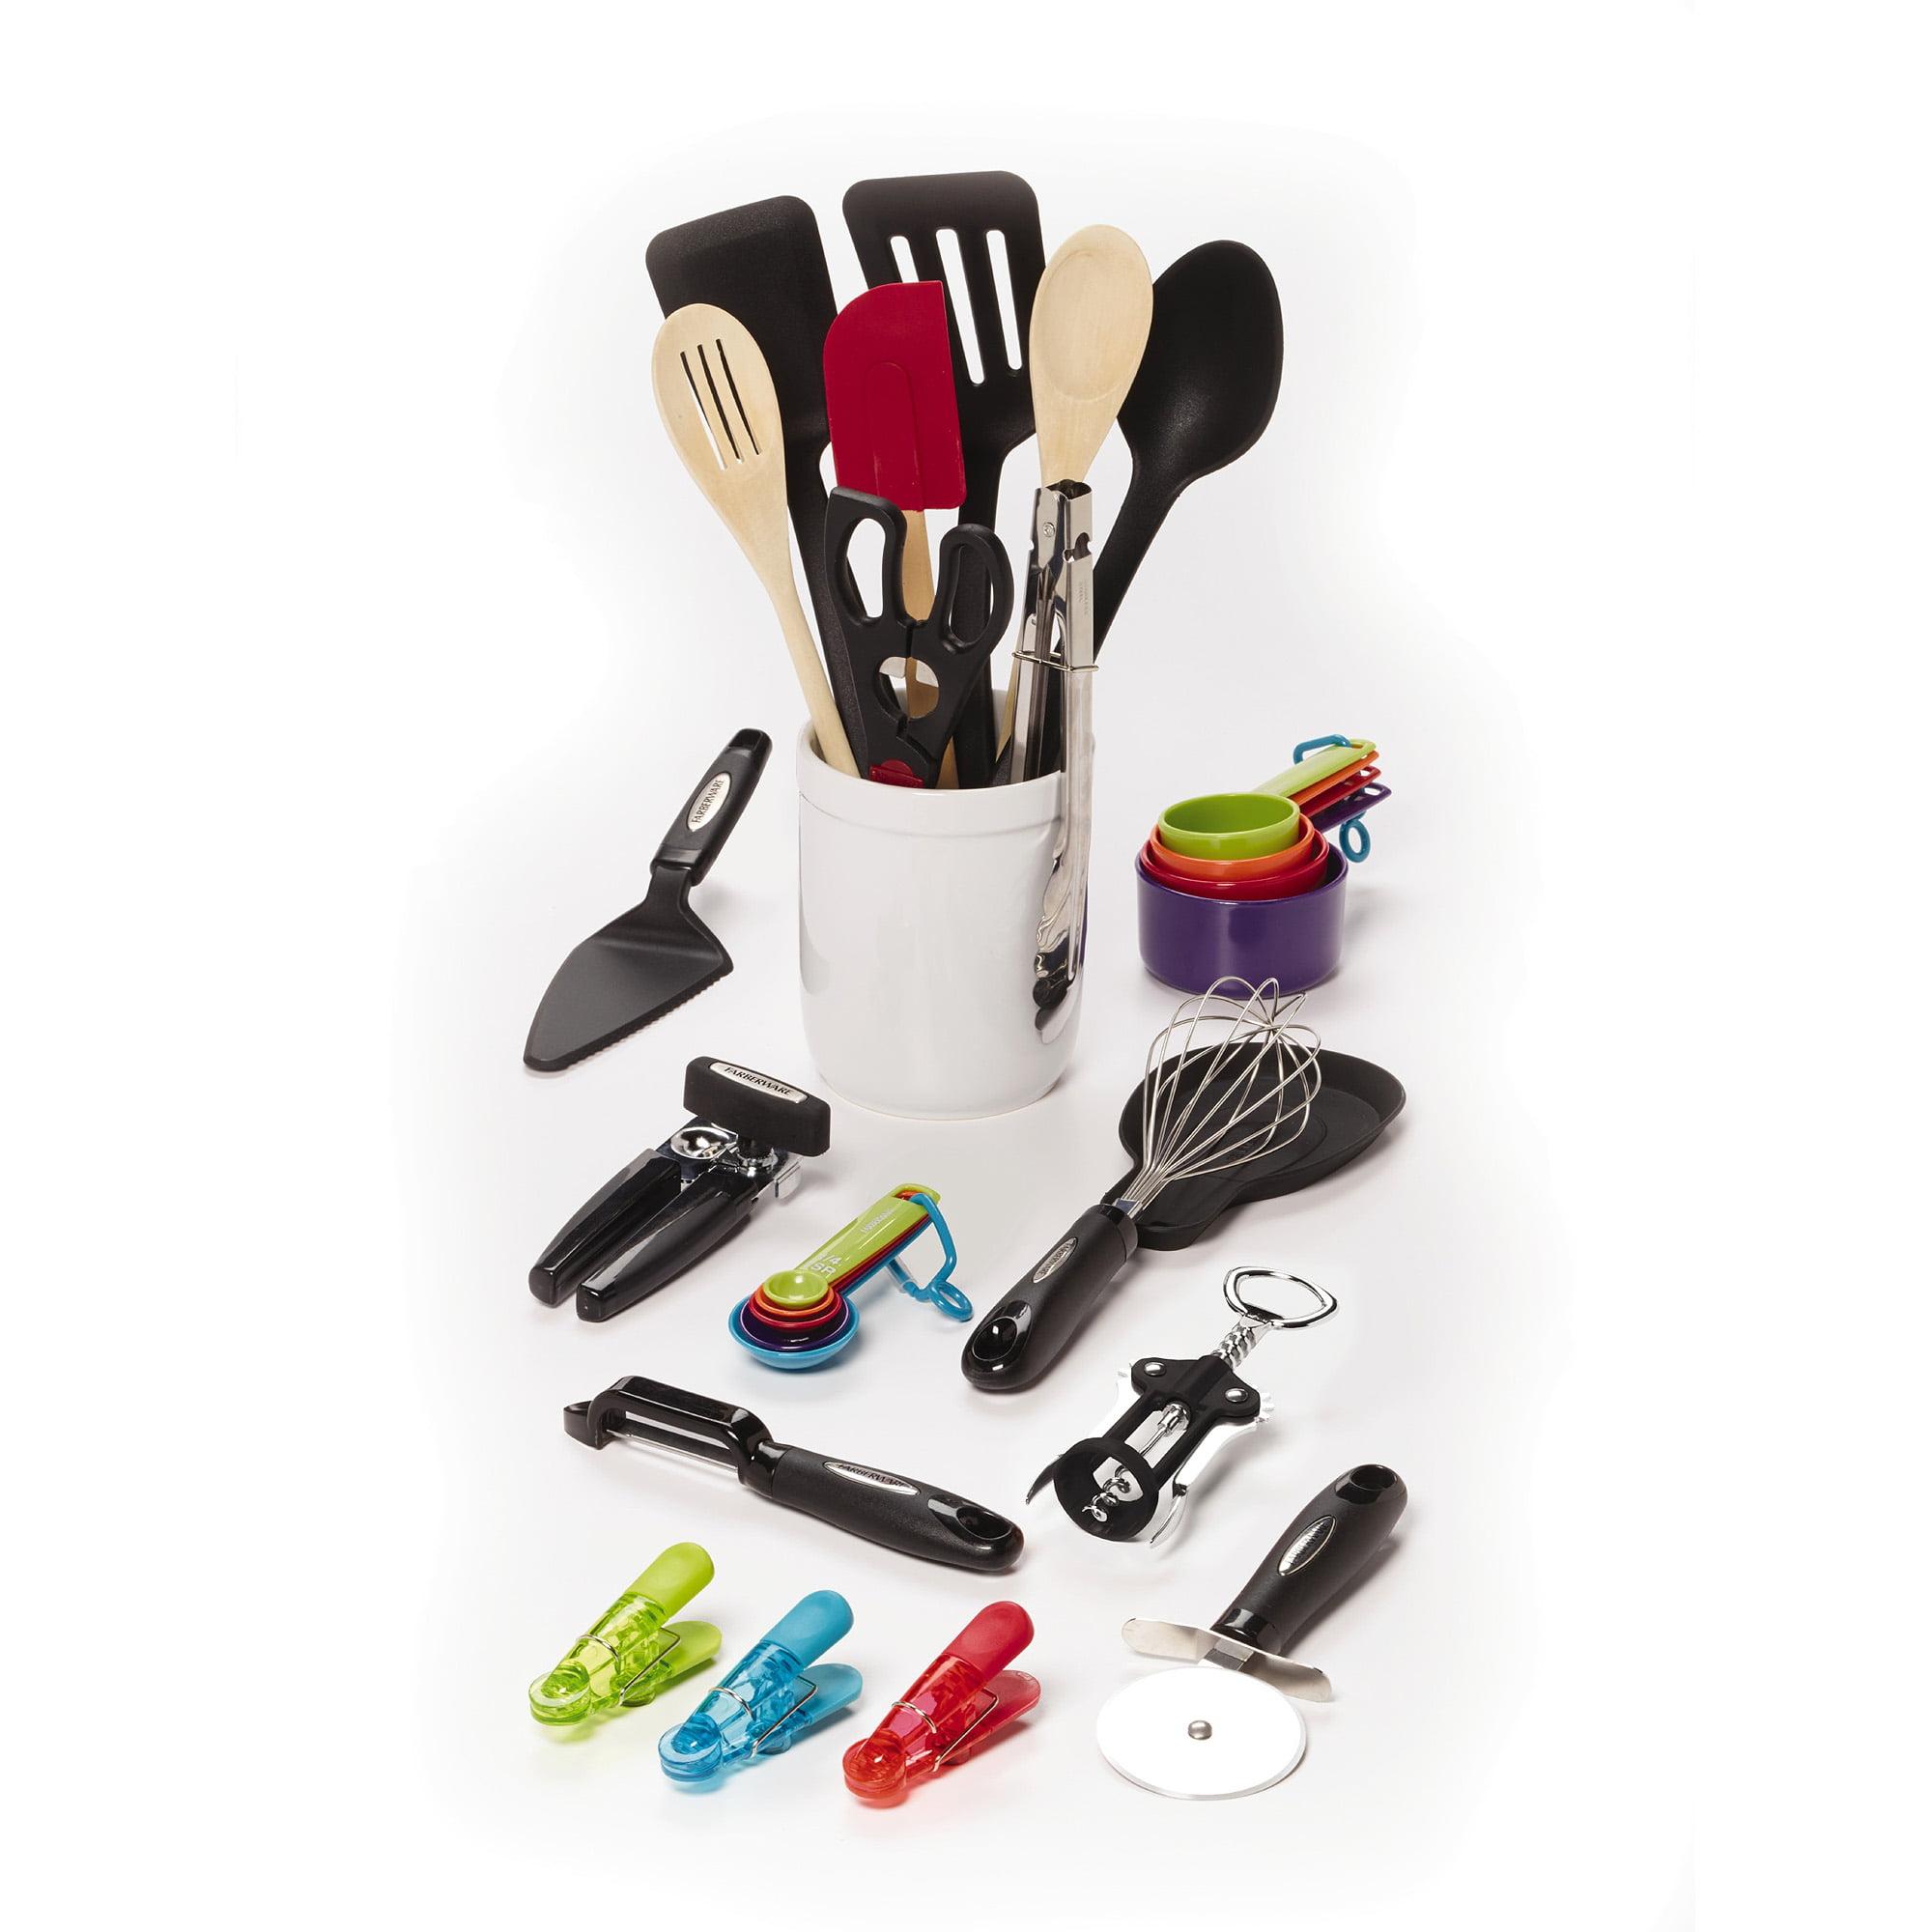 Farberware 28-Piece Tool and Gadget Set